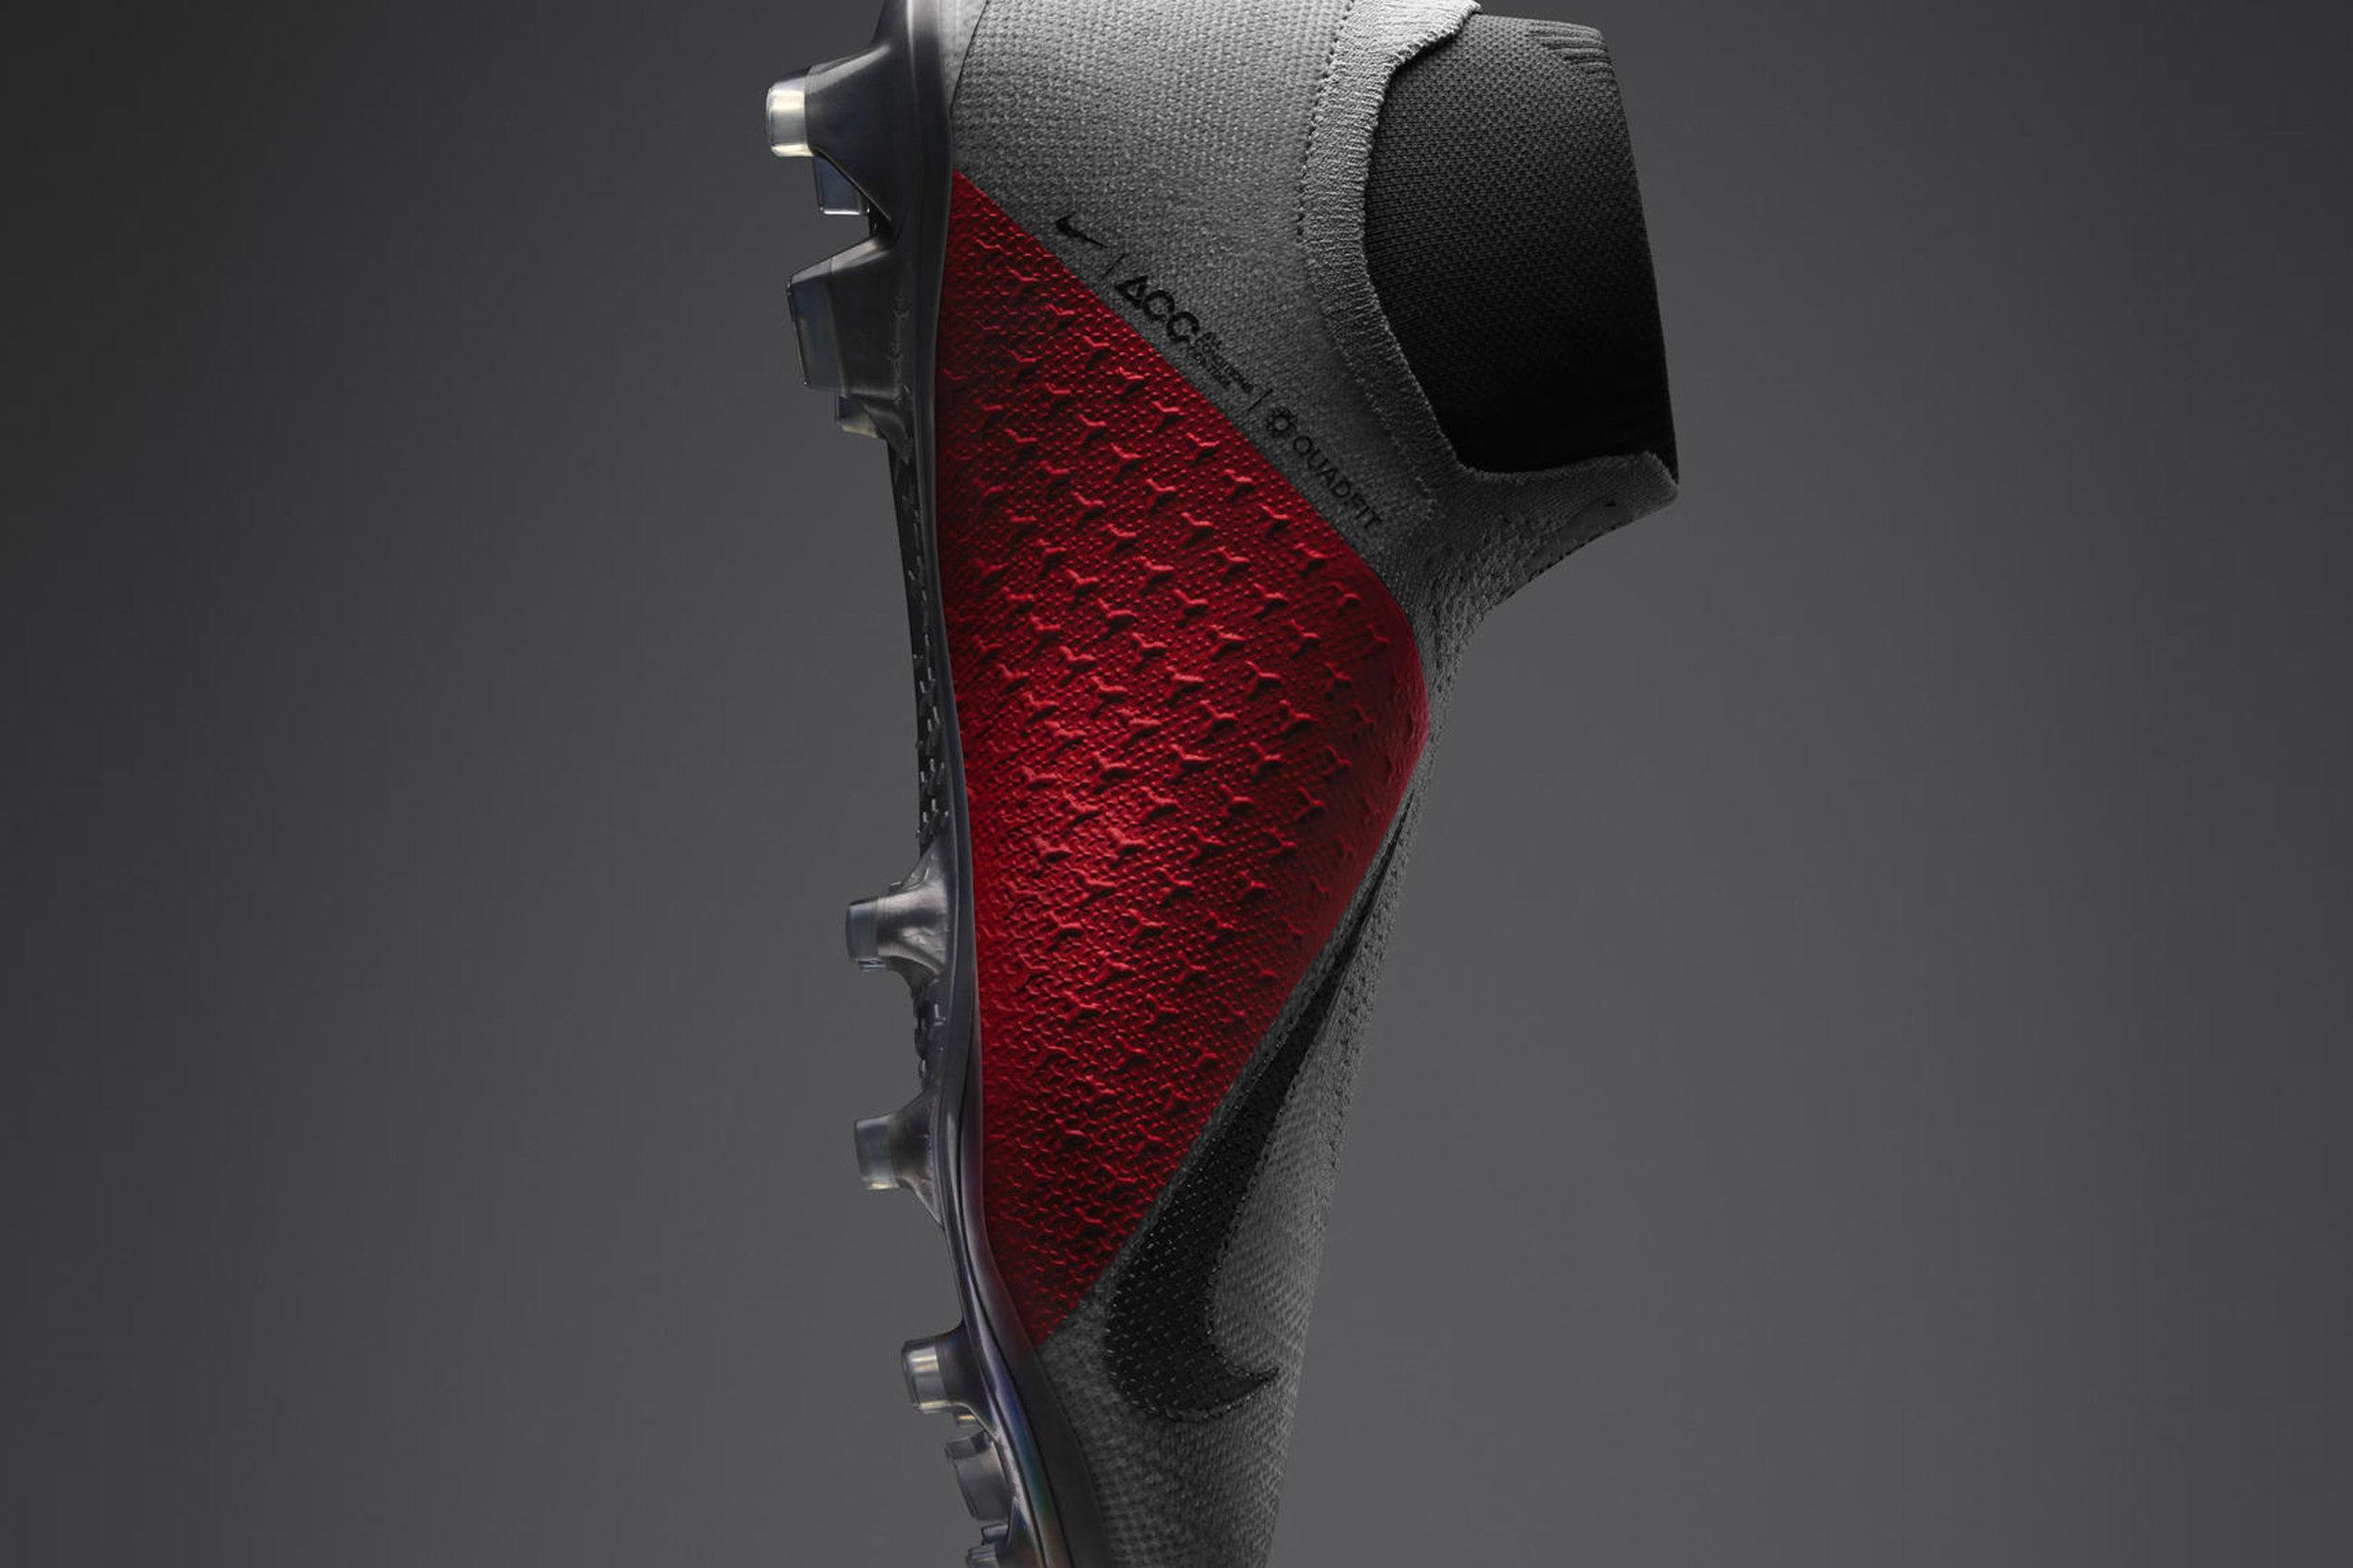 nike-phantom-football-boot-design_dezeen_2364_col_7.jpg